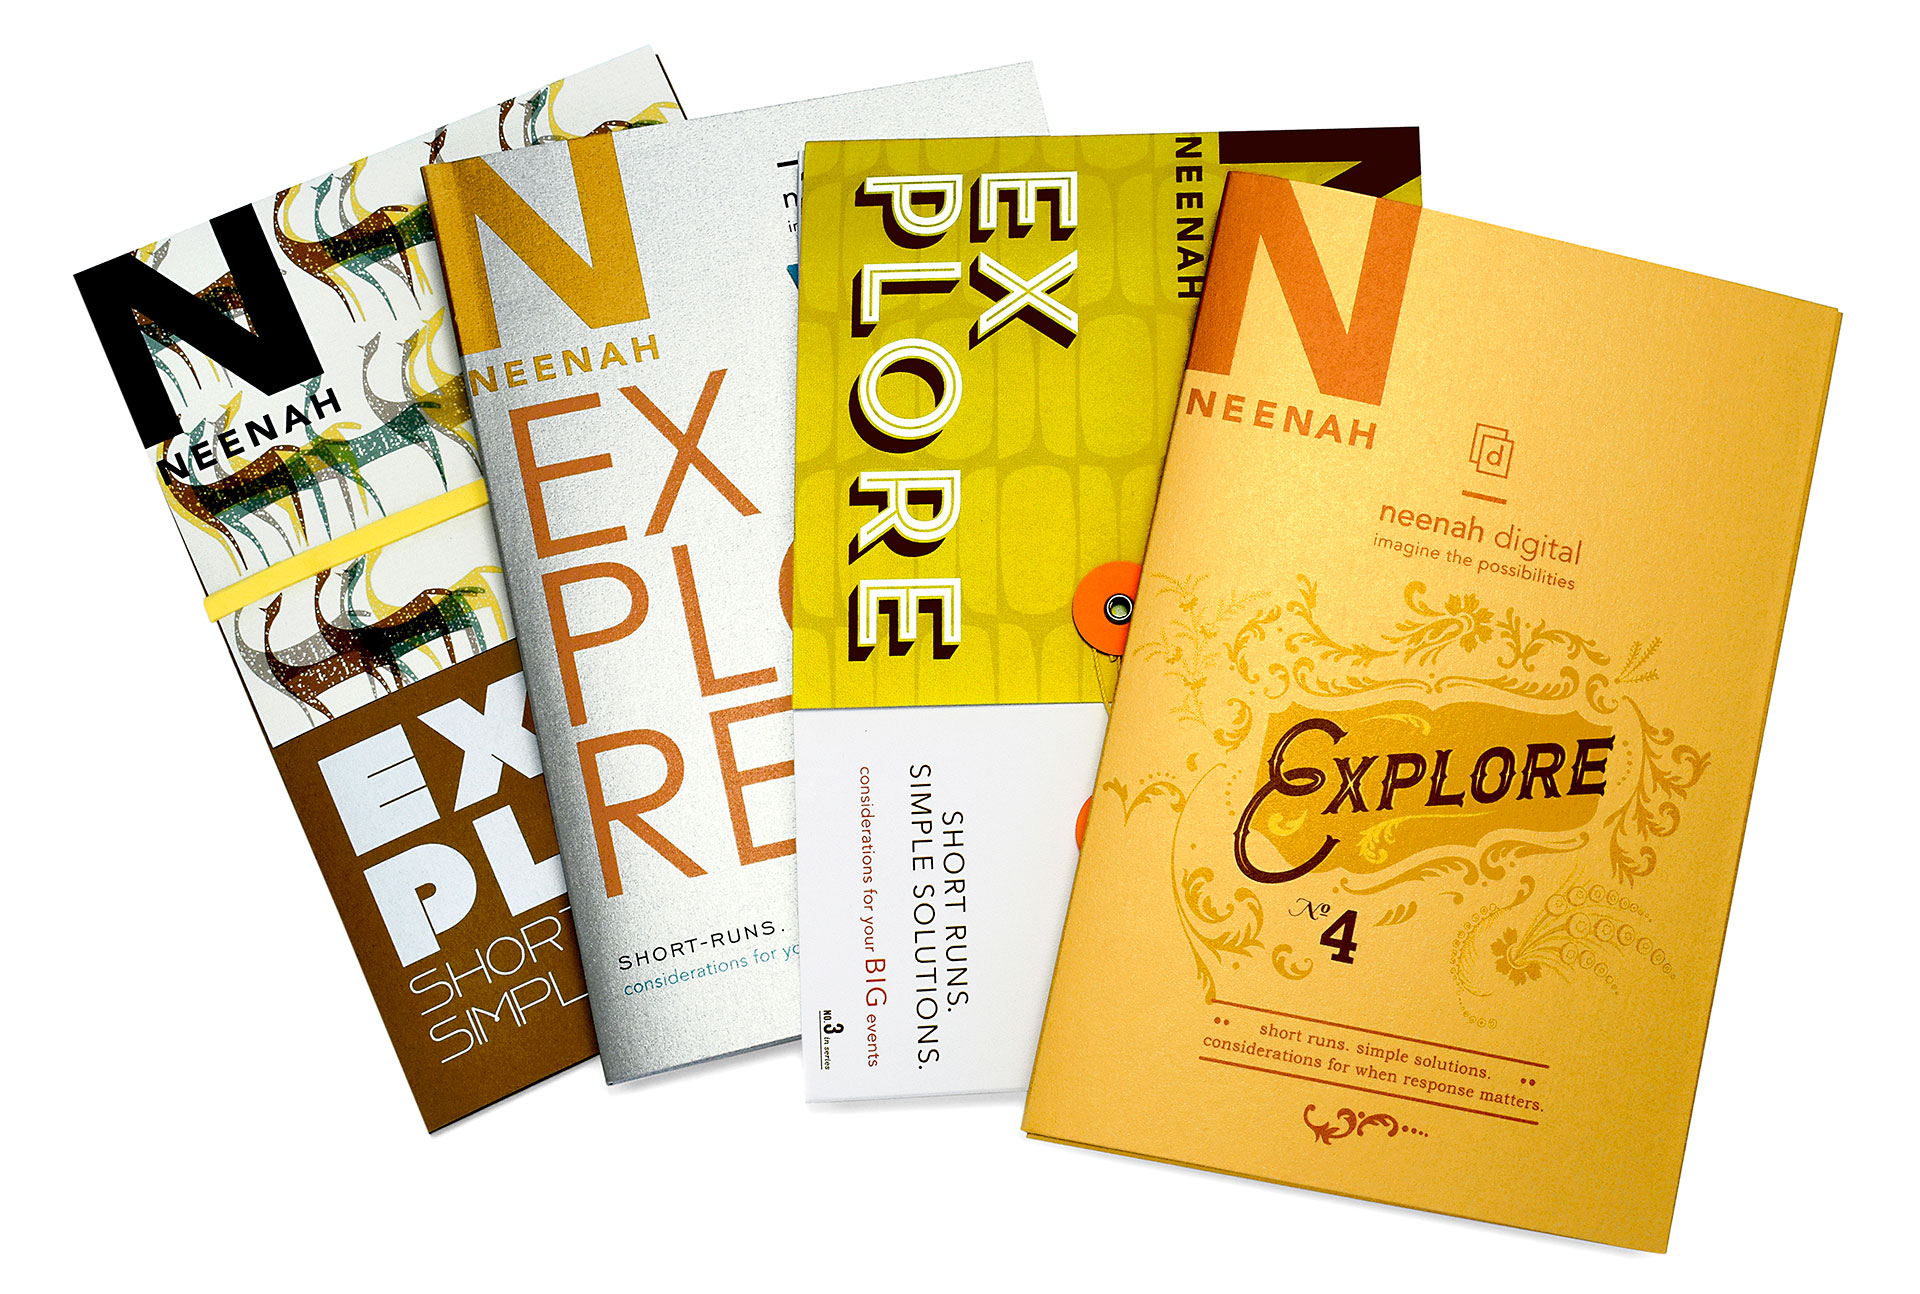 neenah-explore4-2